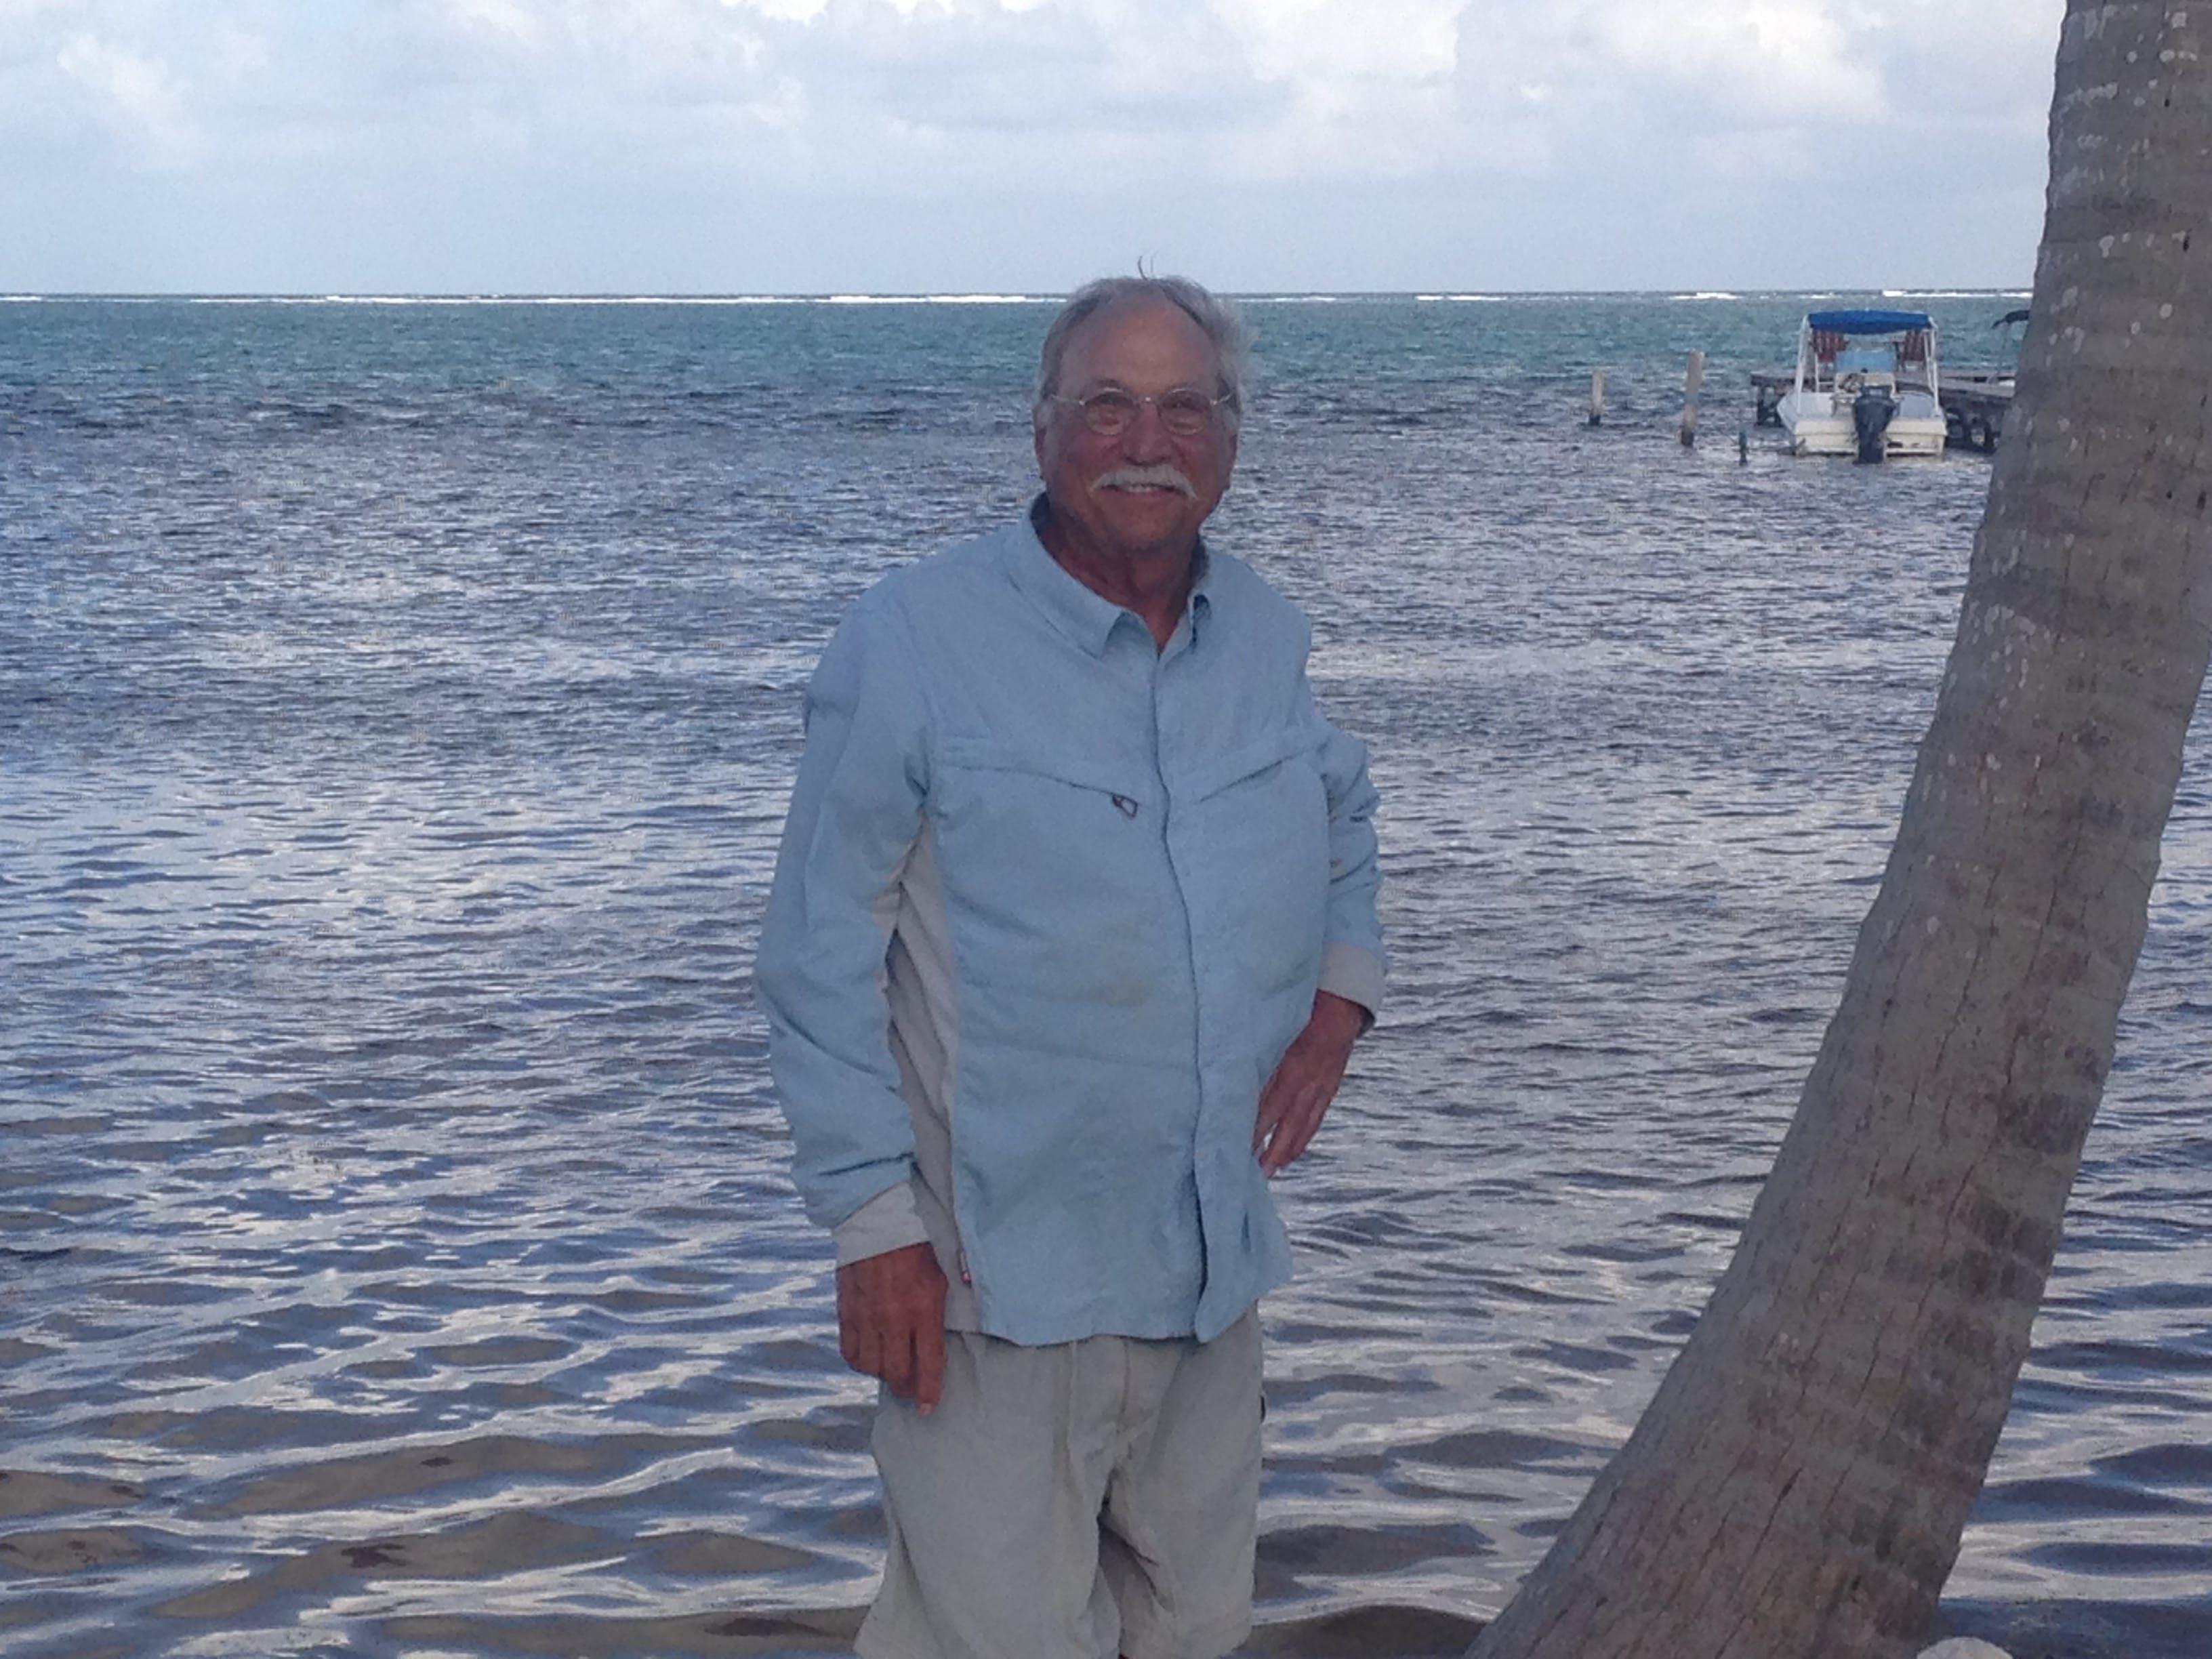 Gordan Paxman posing in front of body of water